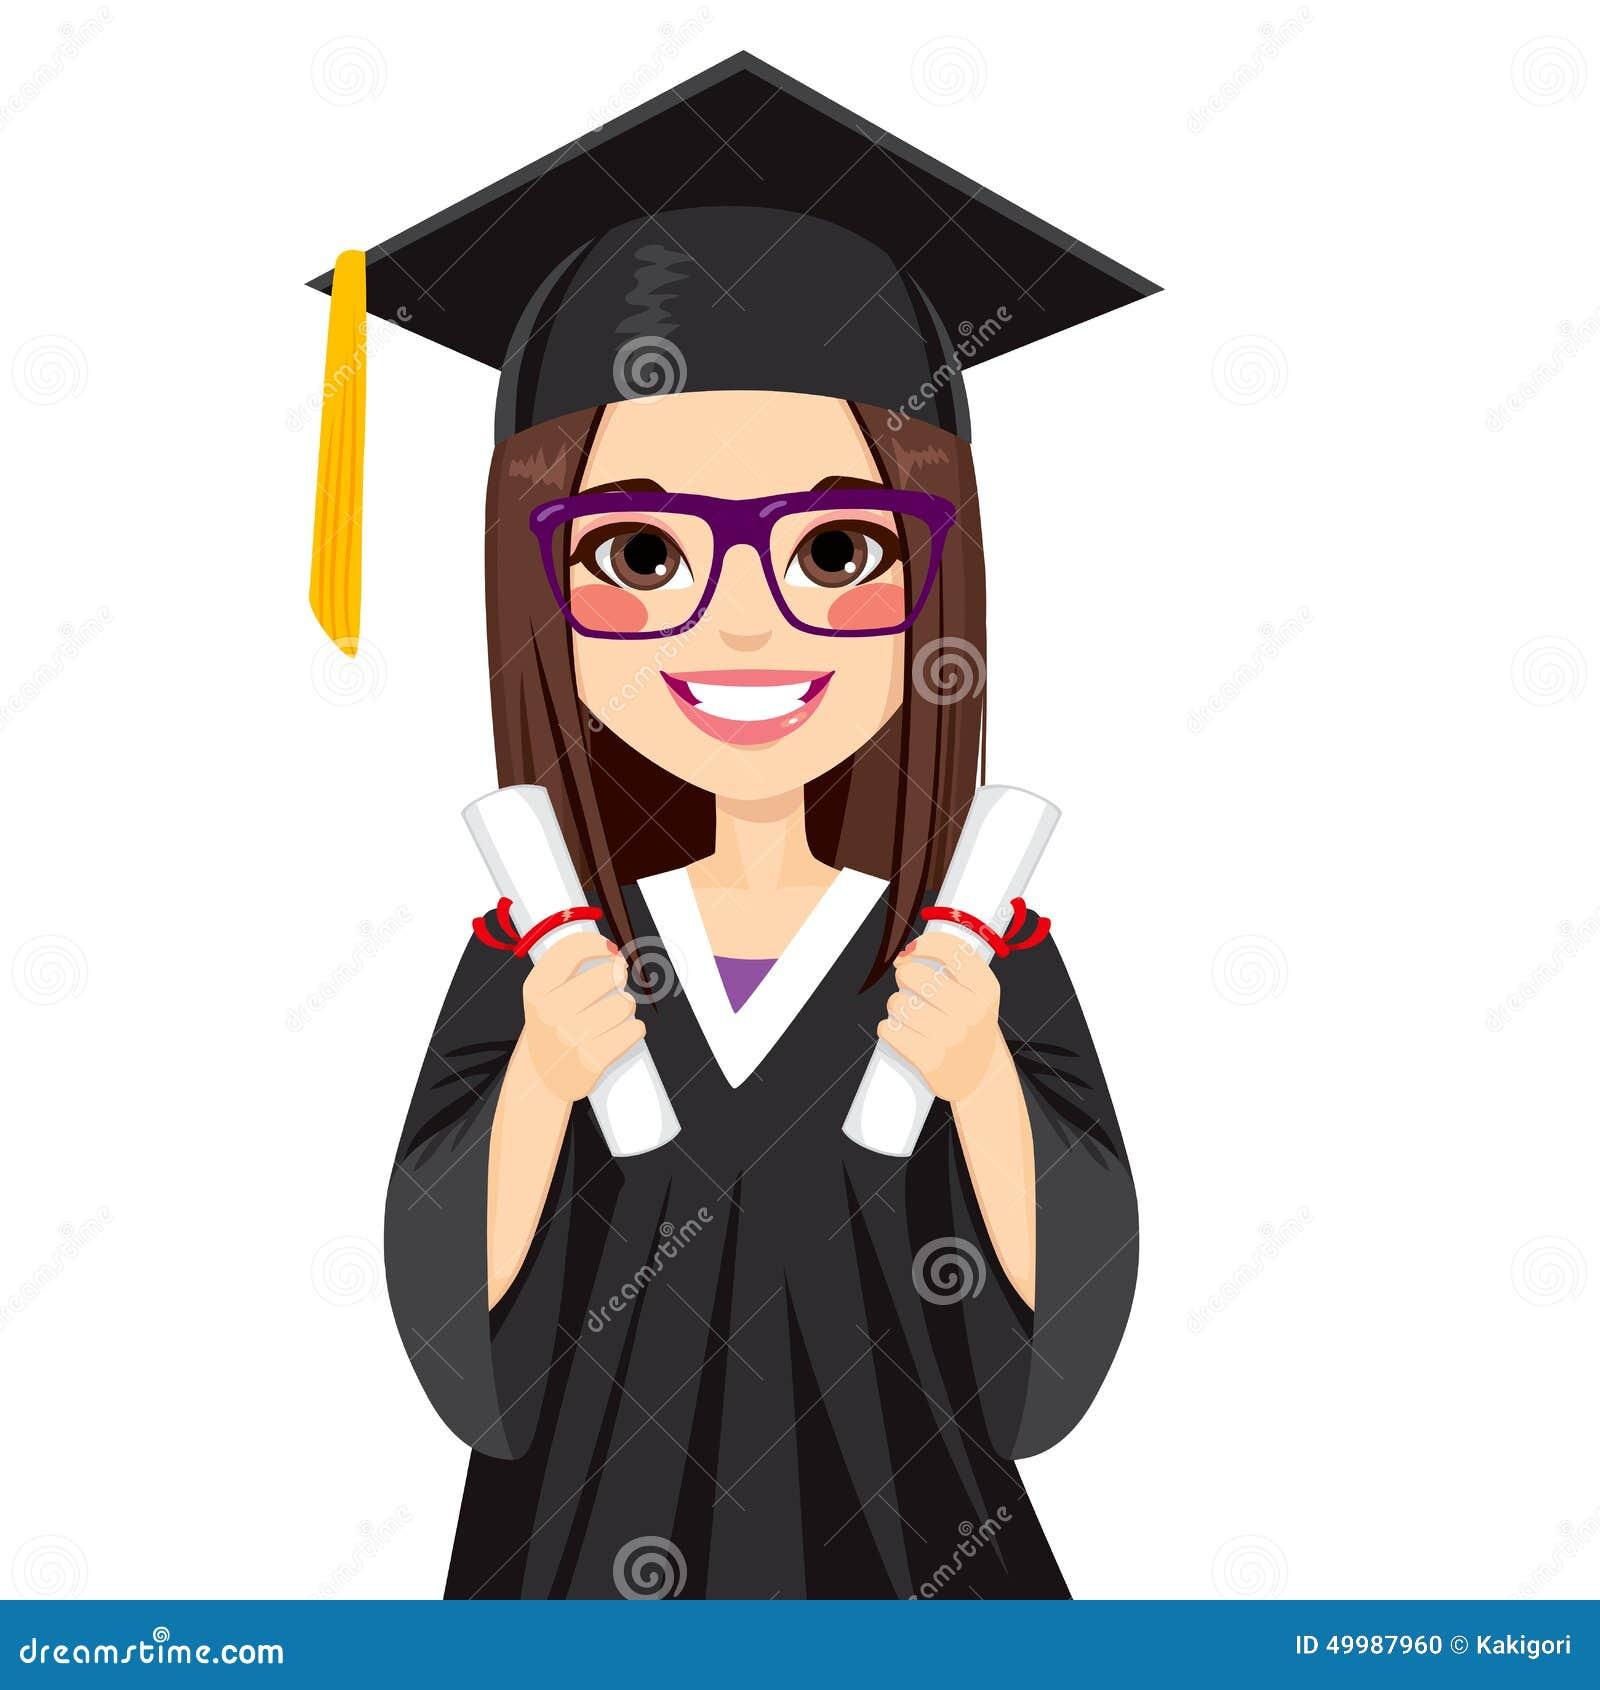 congratulations for your graduation